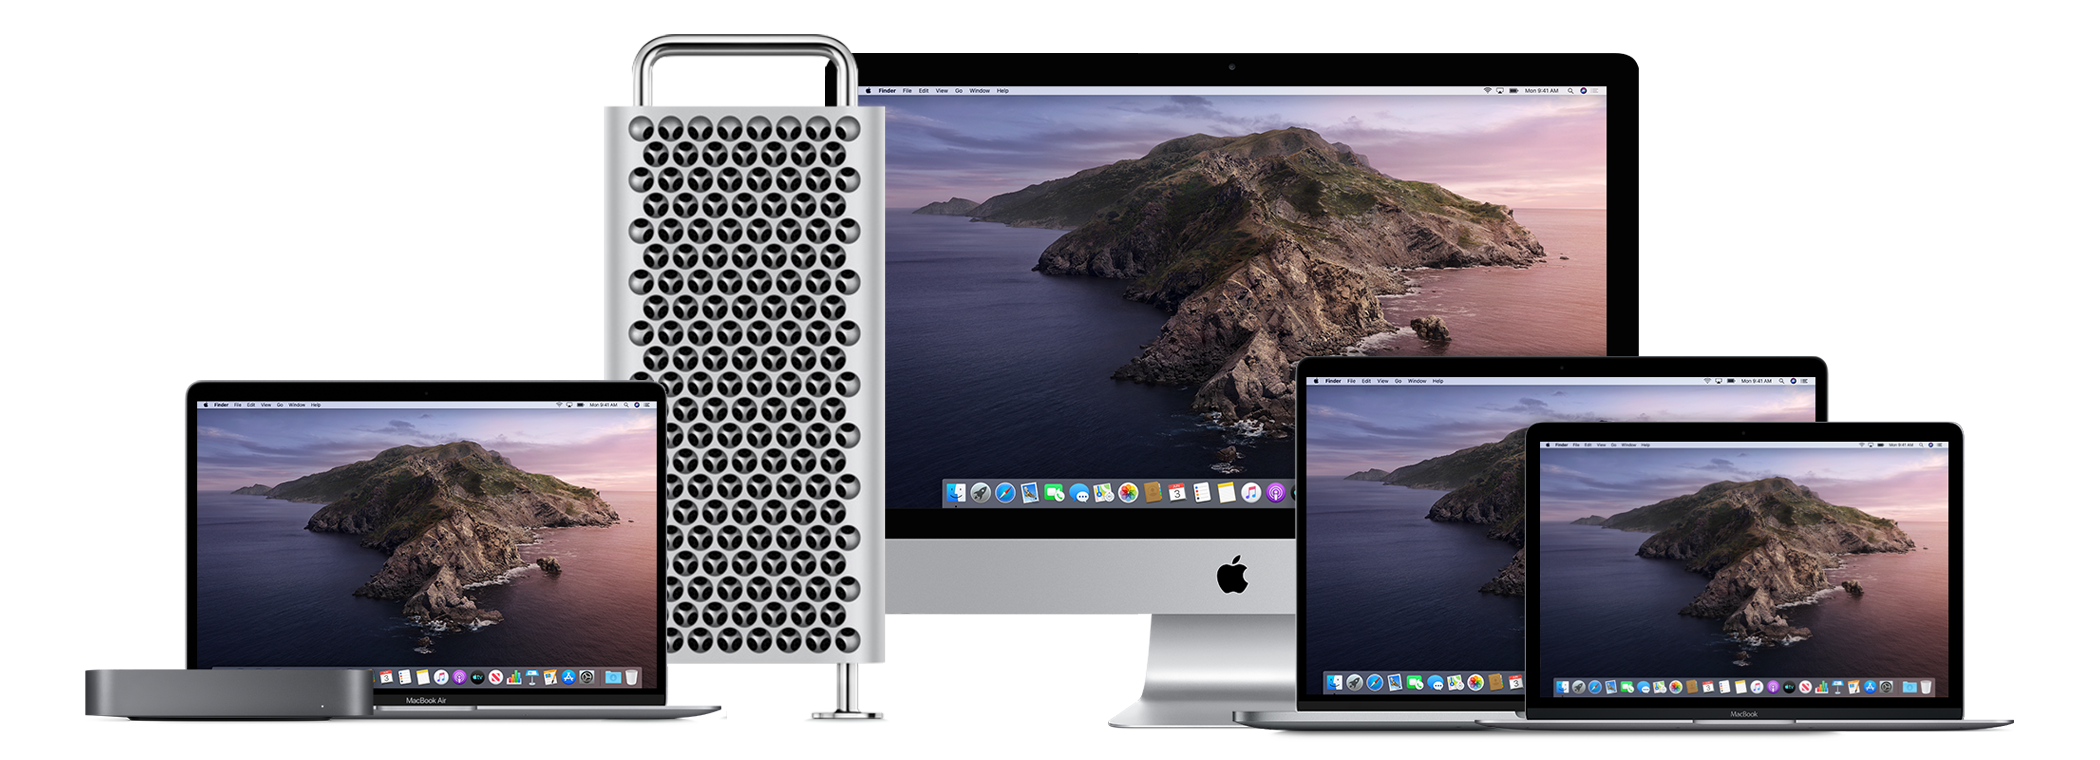 sell macbook iphone ipad